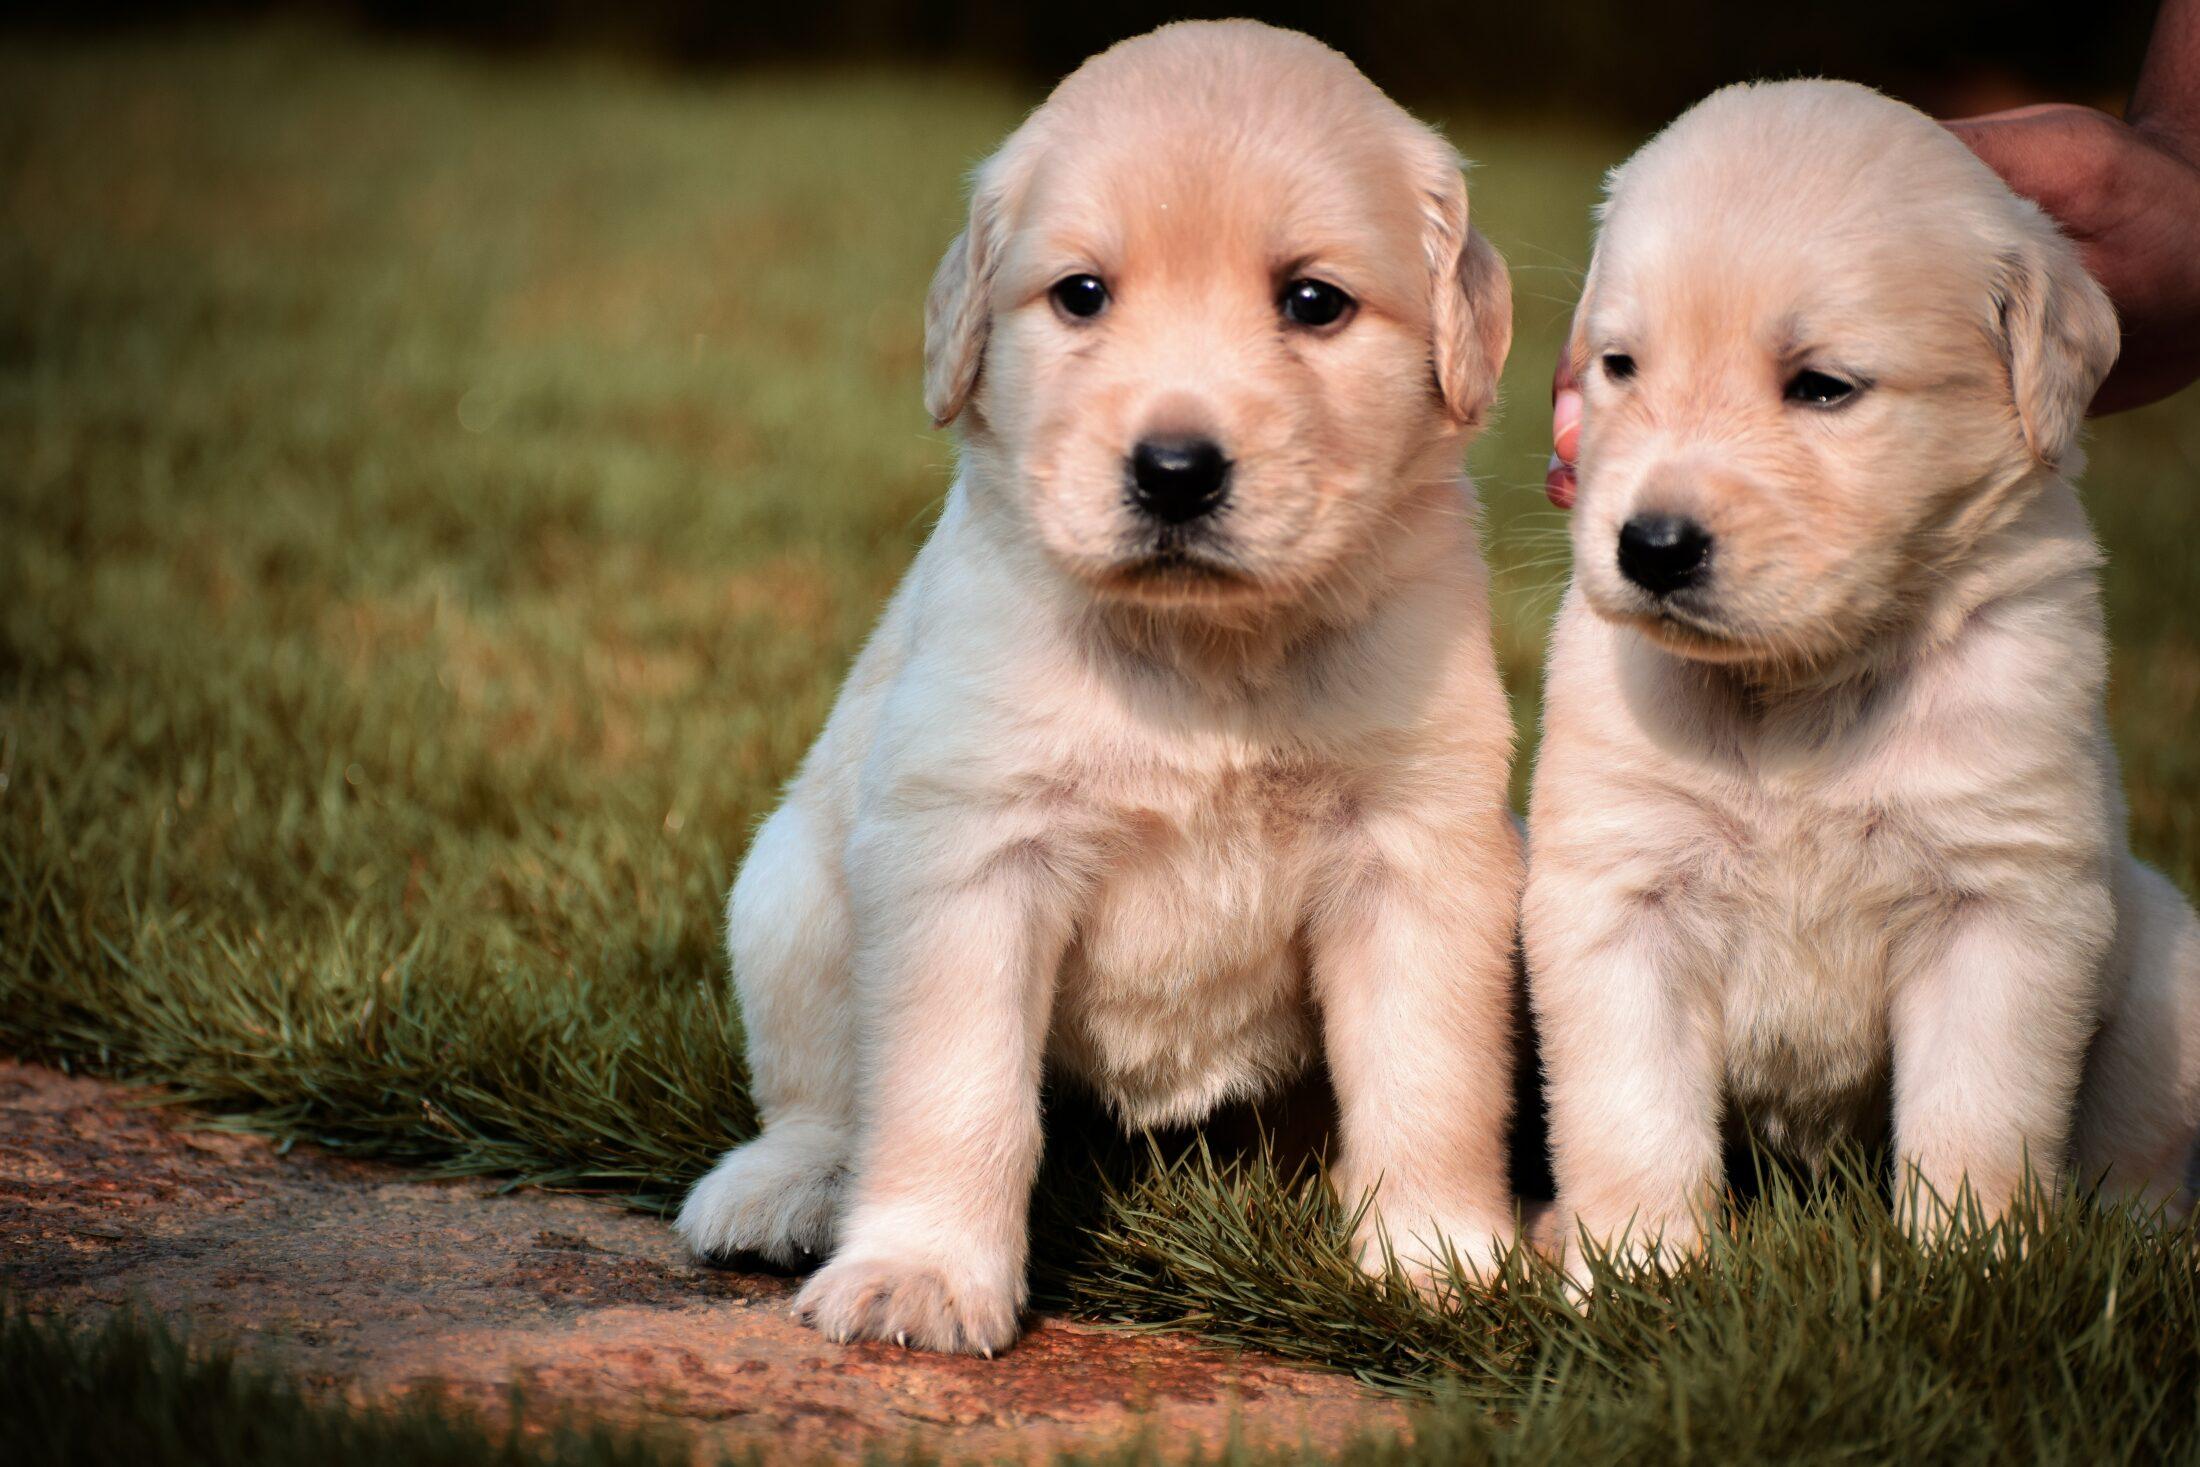 Cachorro e gato juntos - golden retriever